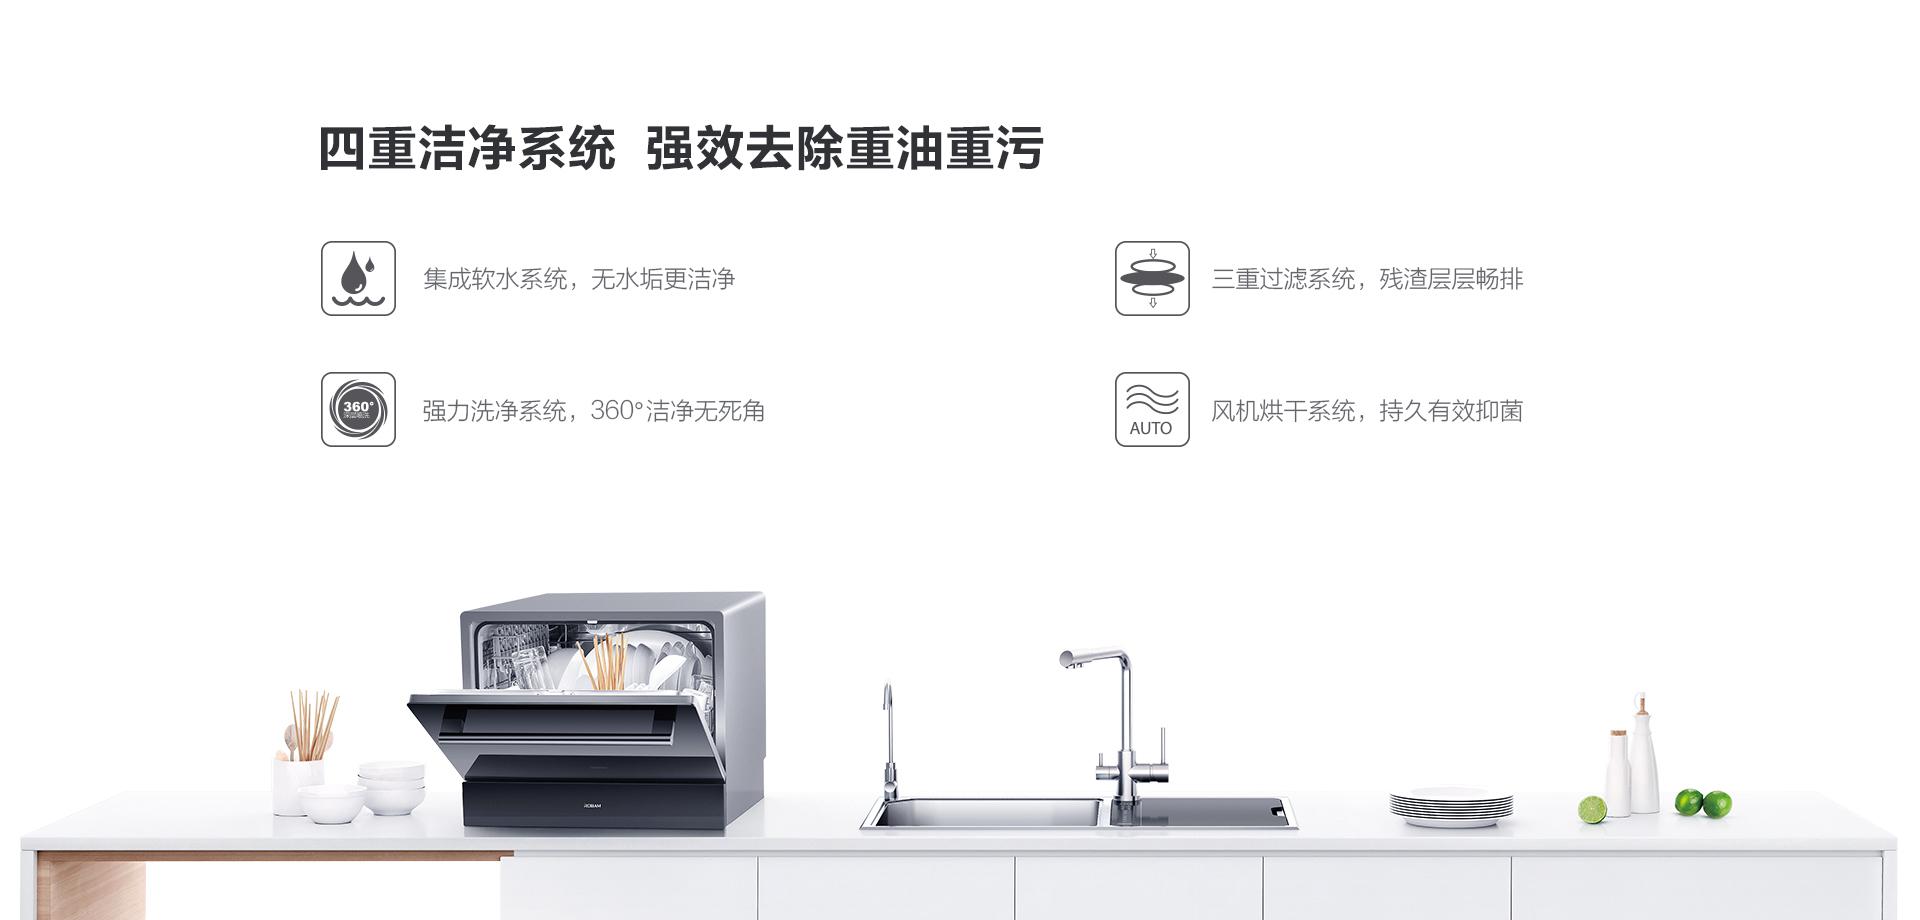 W703-洗碗机上新-190513-网页版_04.jpg